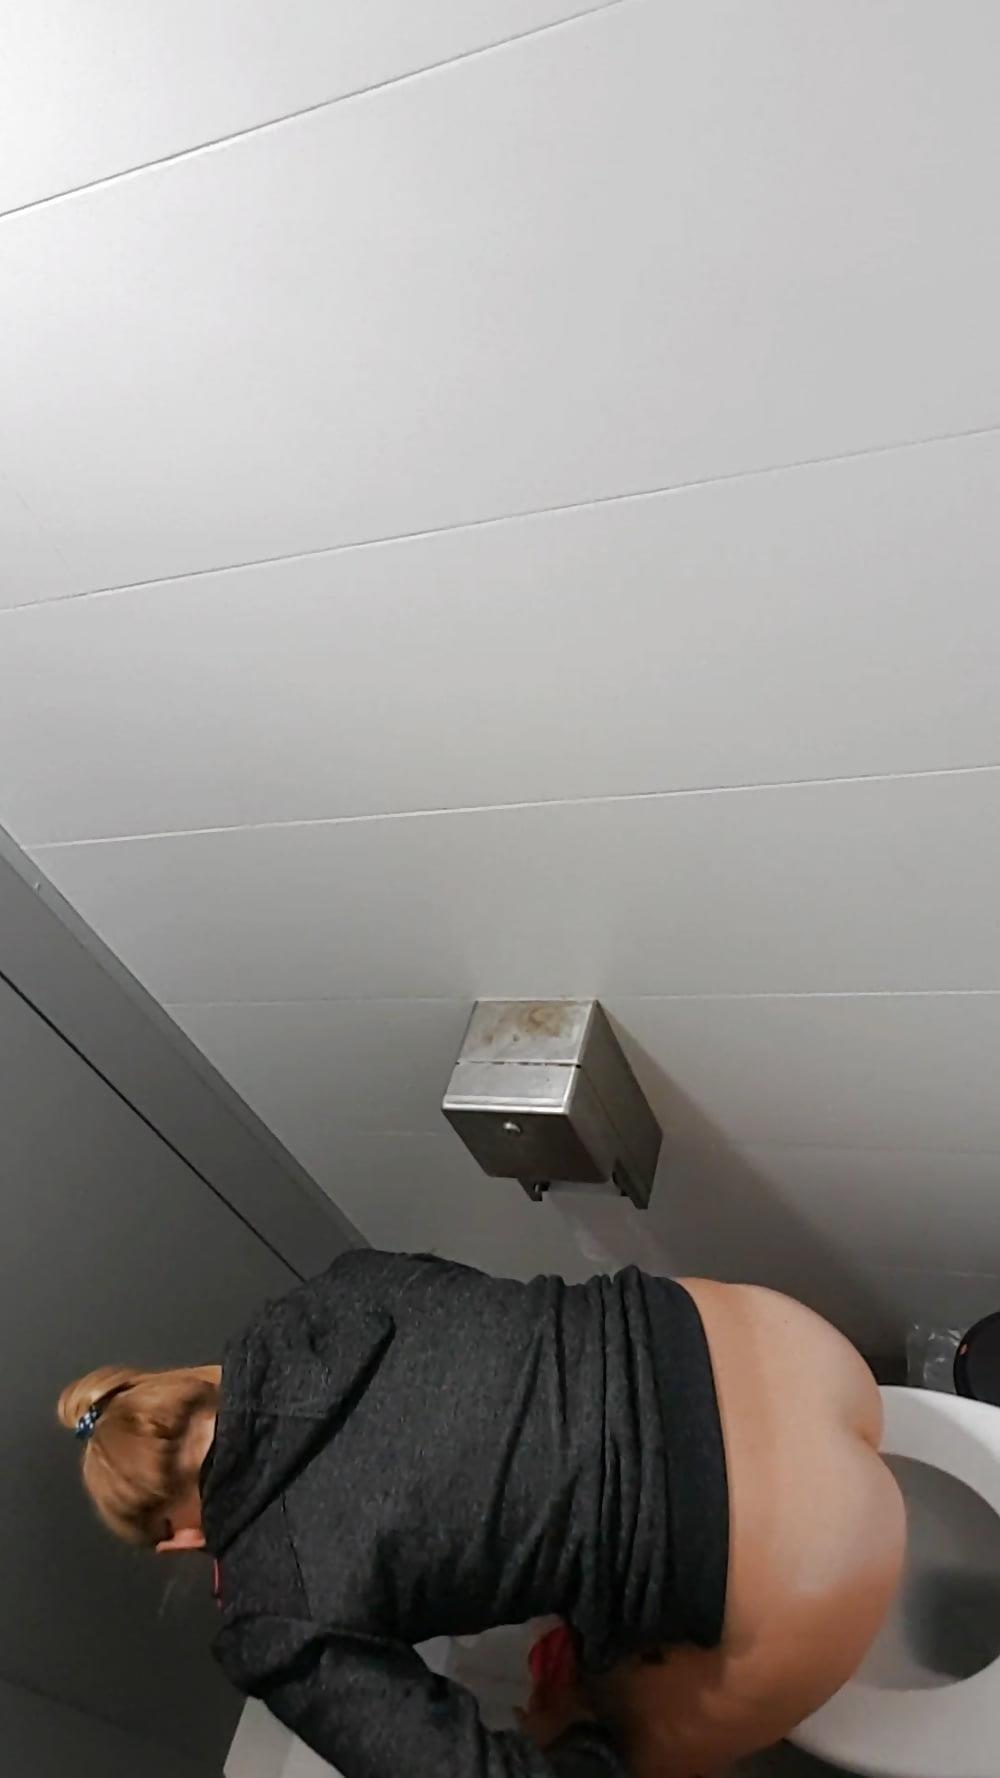 Public toilet spy cam porn-3325